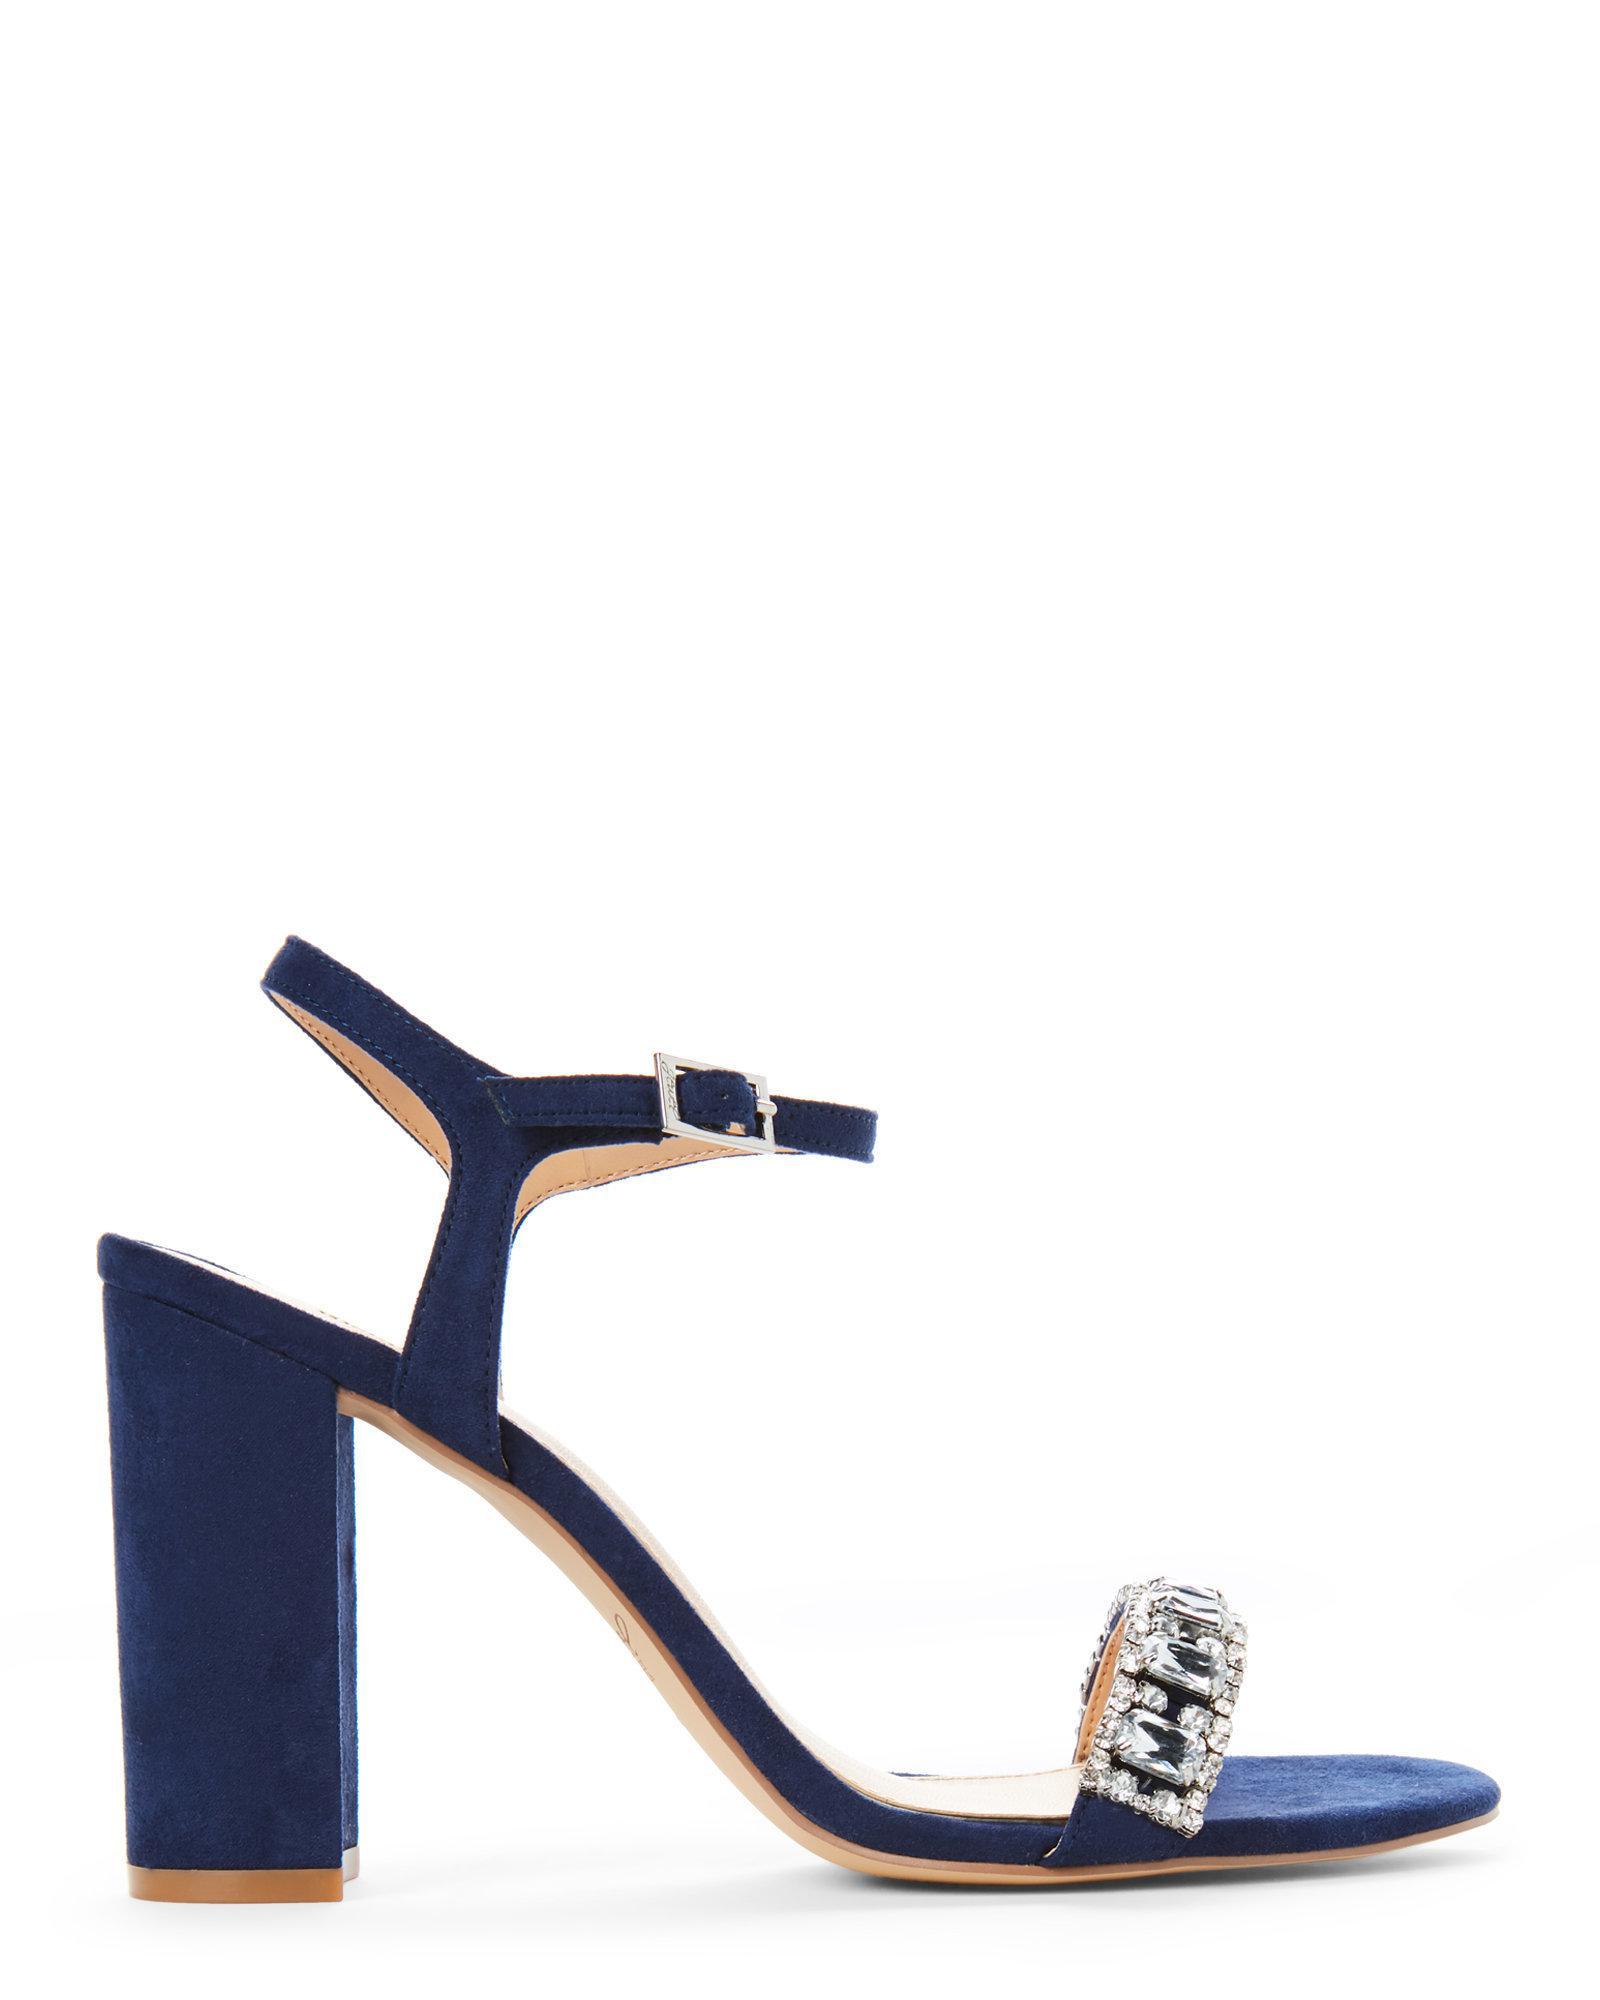 f5aa87d5048 Lyst - Badgley Mischka Navy Hendricks Embellished Block Heel Sandals ...